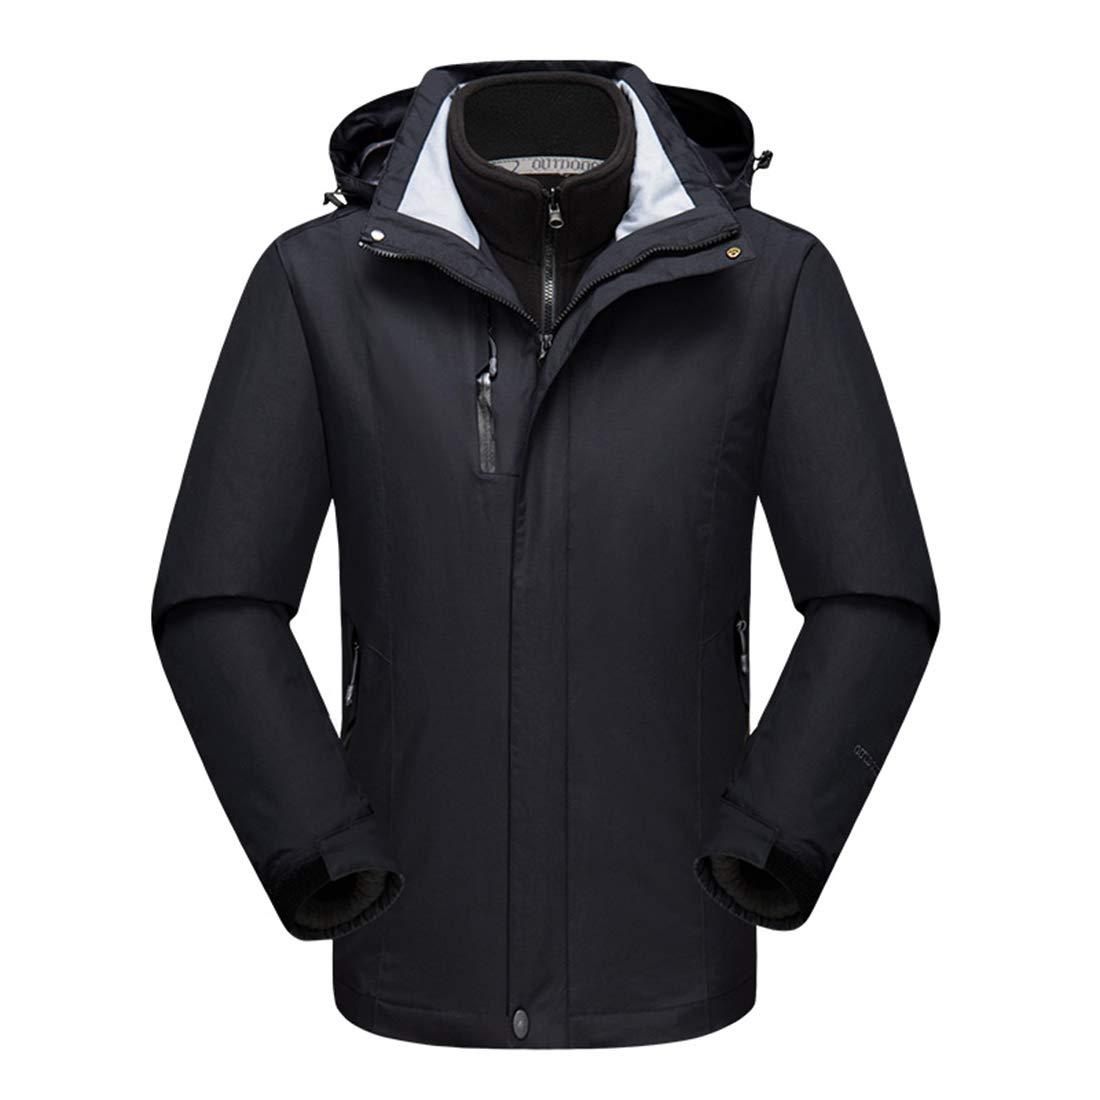 Black Tag XL   US L Alomoc Men's 3 in 1 Winter Hiking Jacket Waterproof Snowboard Coats with Hood